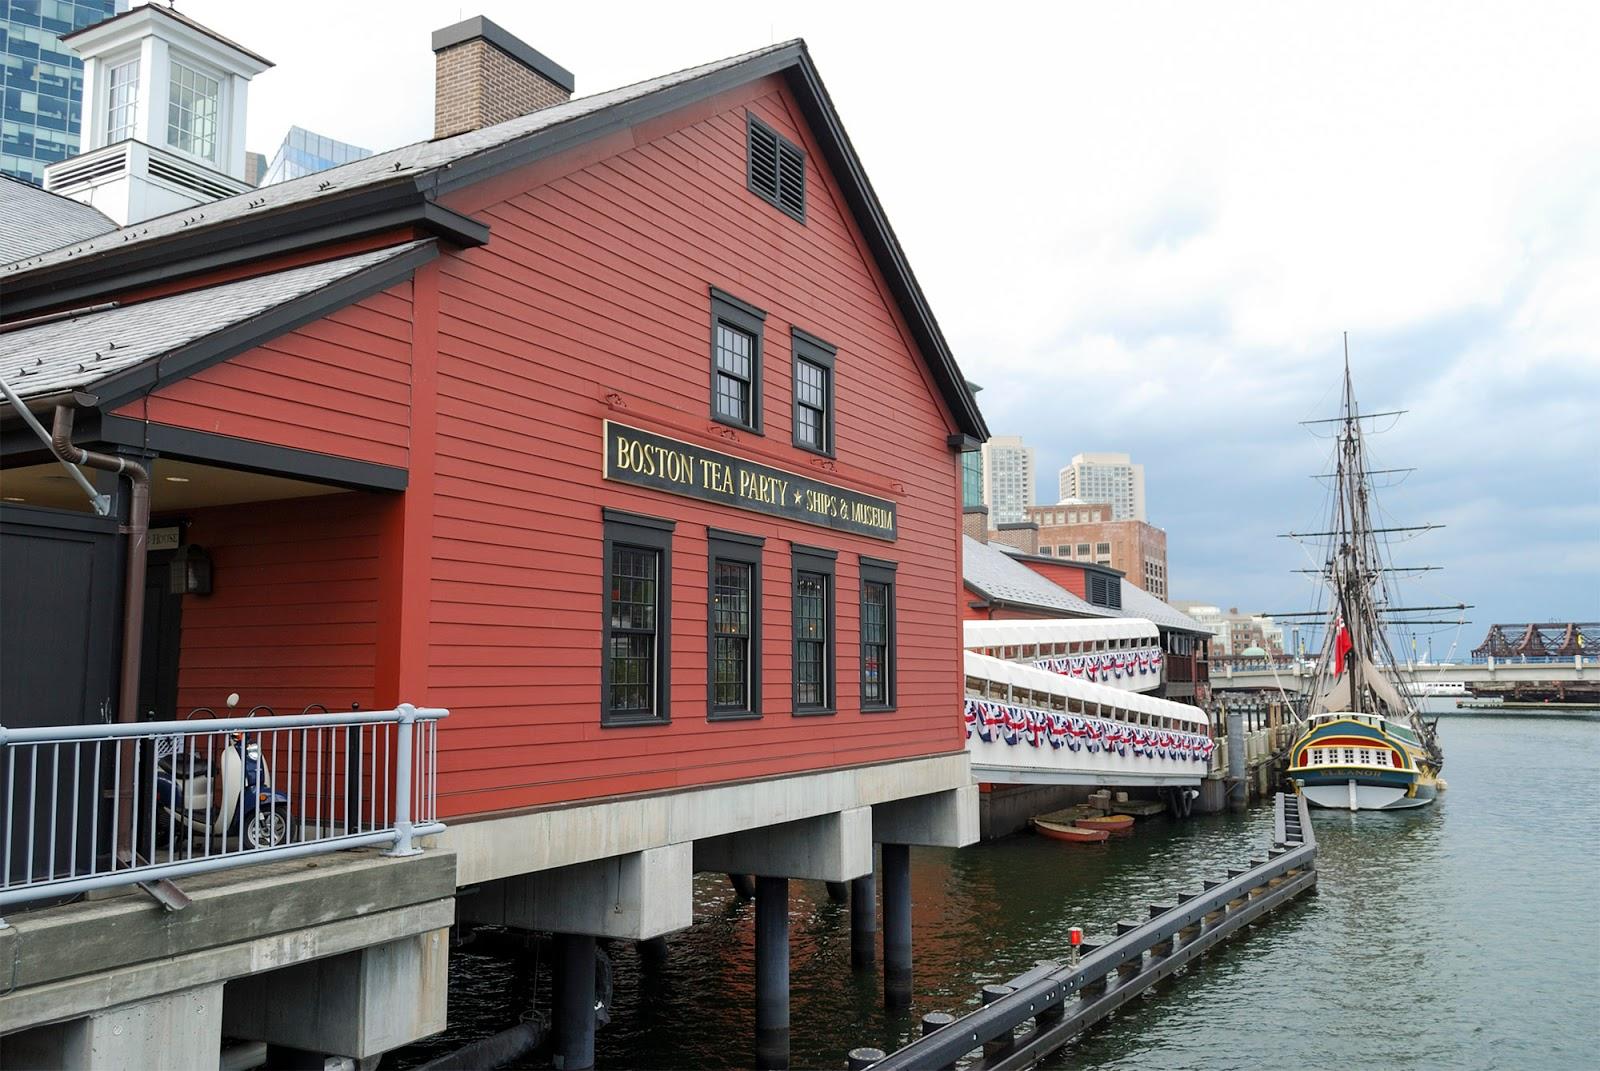 tea part ships museum boston itinerary plan guide tourism usa america park east coast